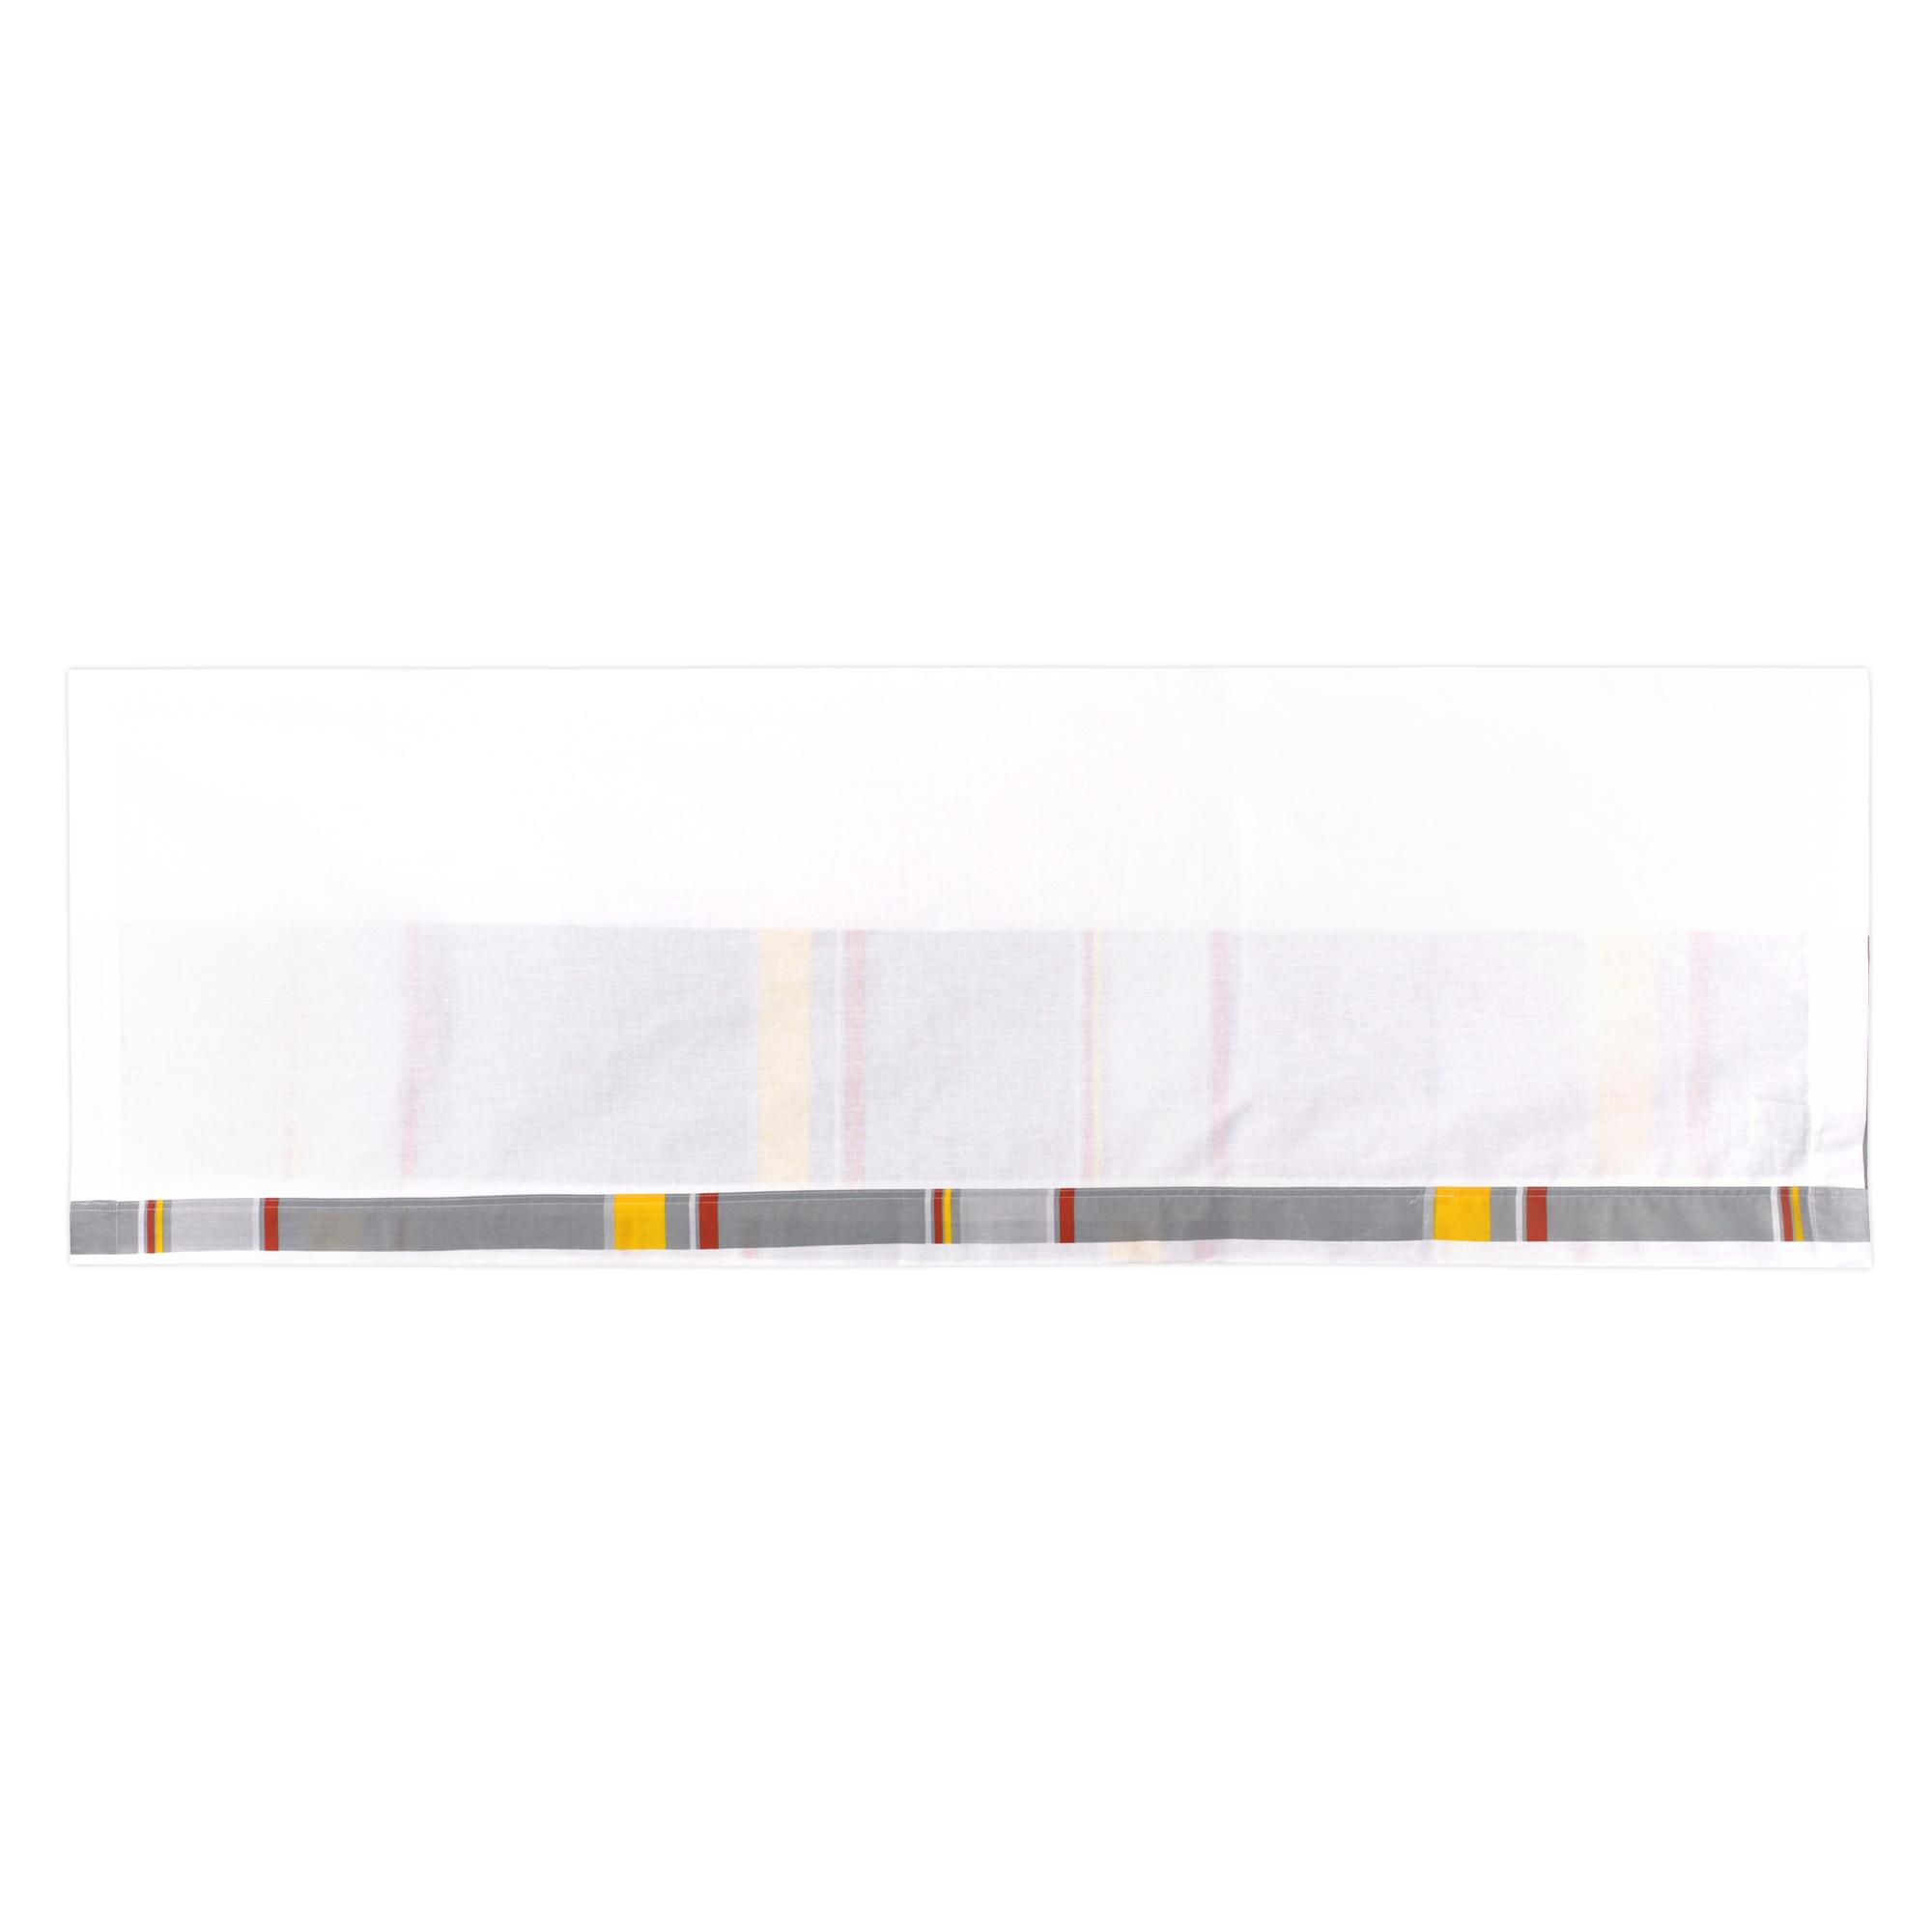 taie de traversin 240x43 cm 100 coton zeste linnea vente de linge de maison. Black Bedroom Furniture Sets. Home Design Ideas